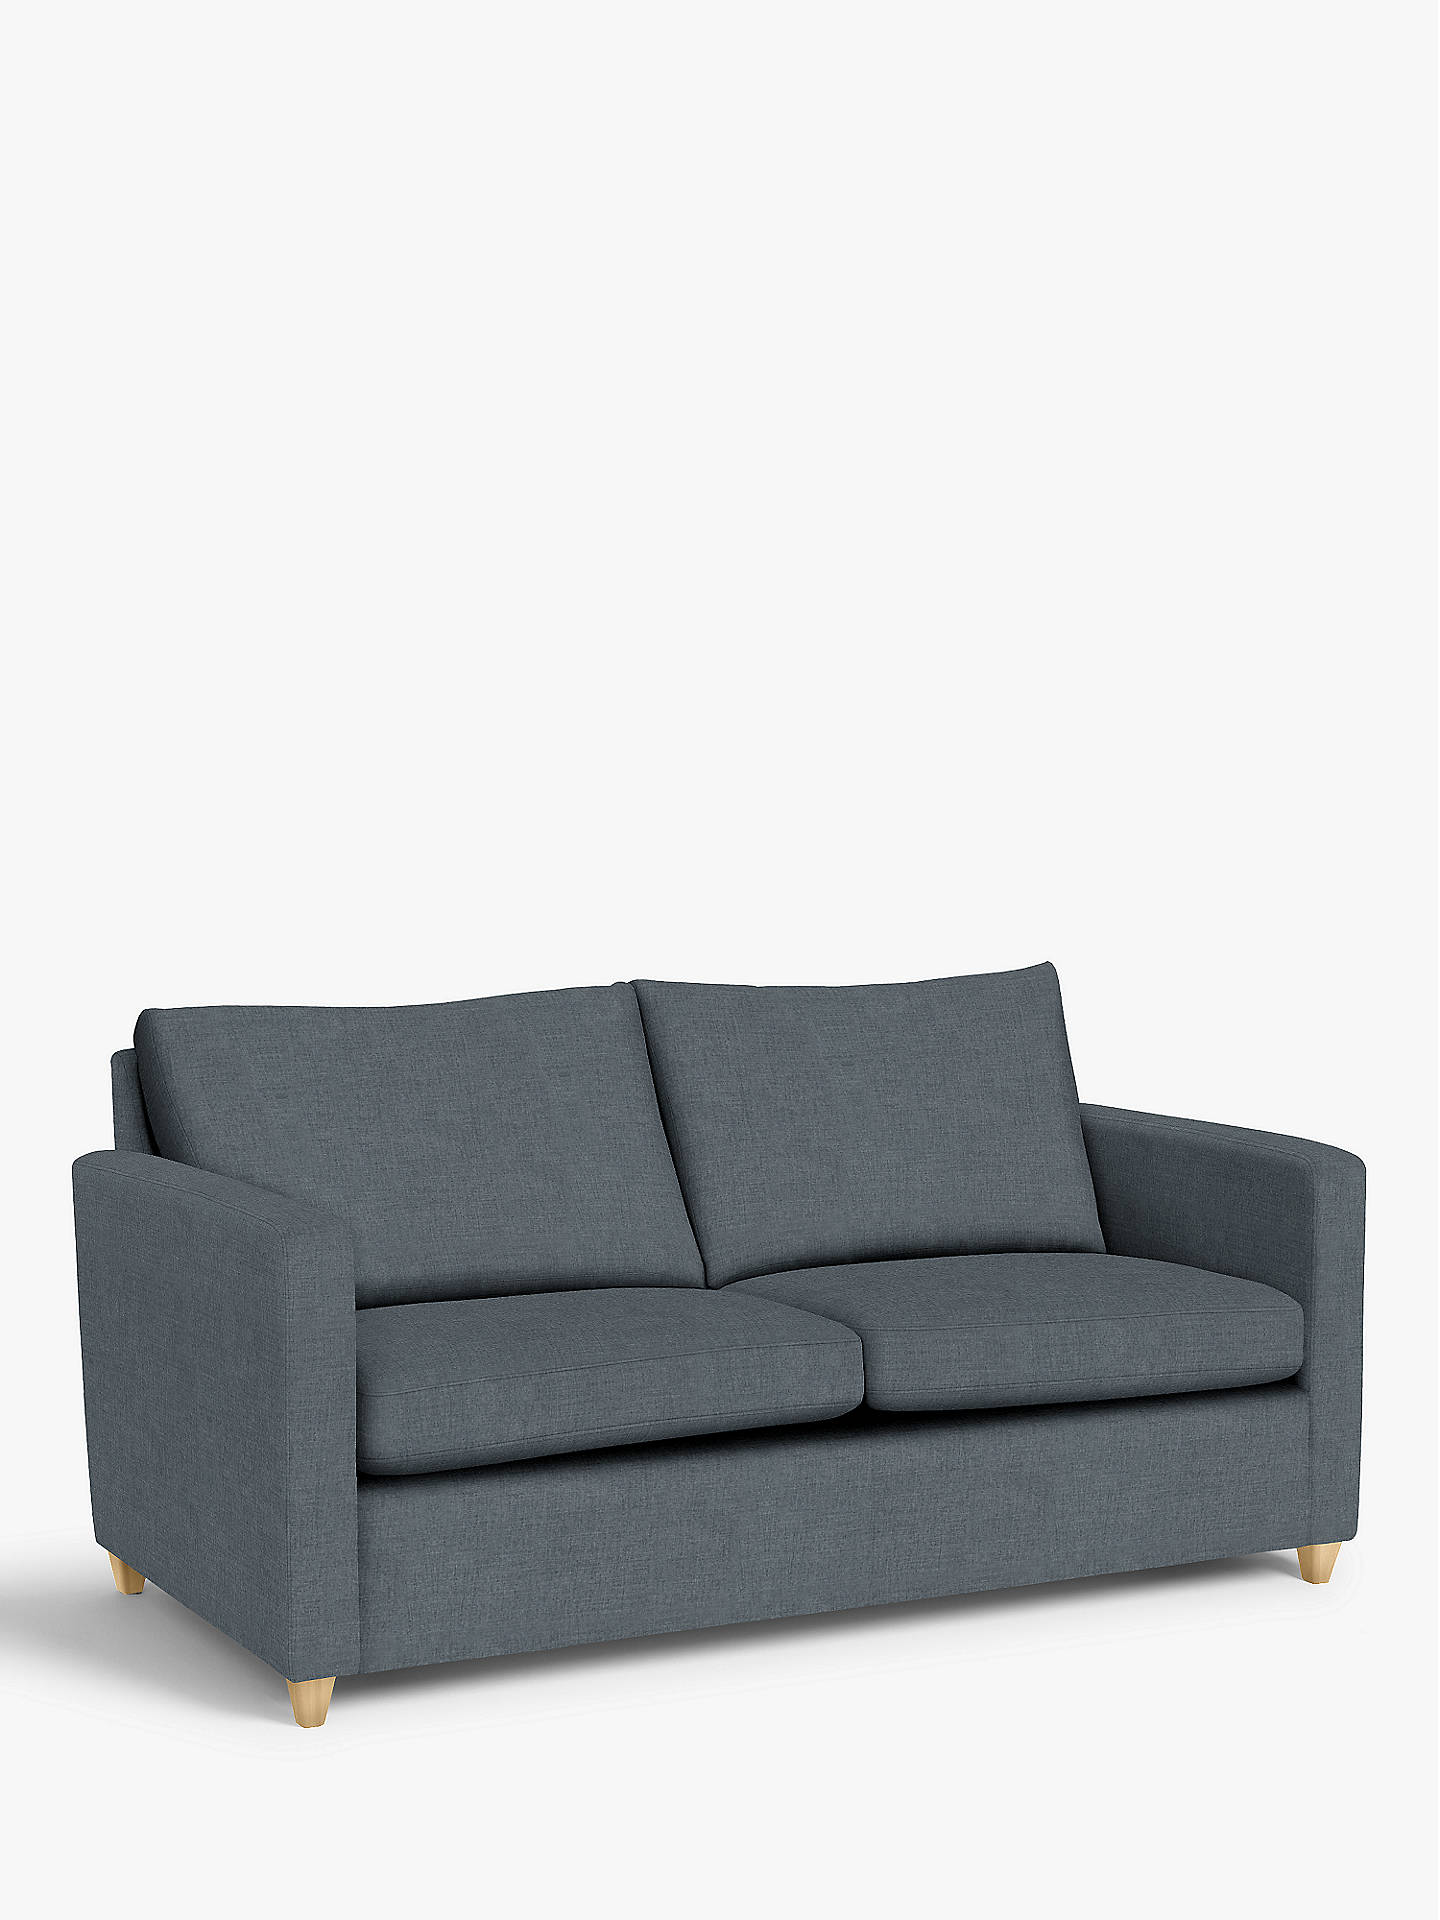 Prime John Lewis Partners Bailey Double Sofa Bed Light Leg Hatton Steel Bralicious Painted Fabric Chair Ideas Braliciousco